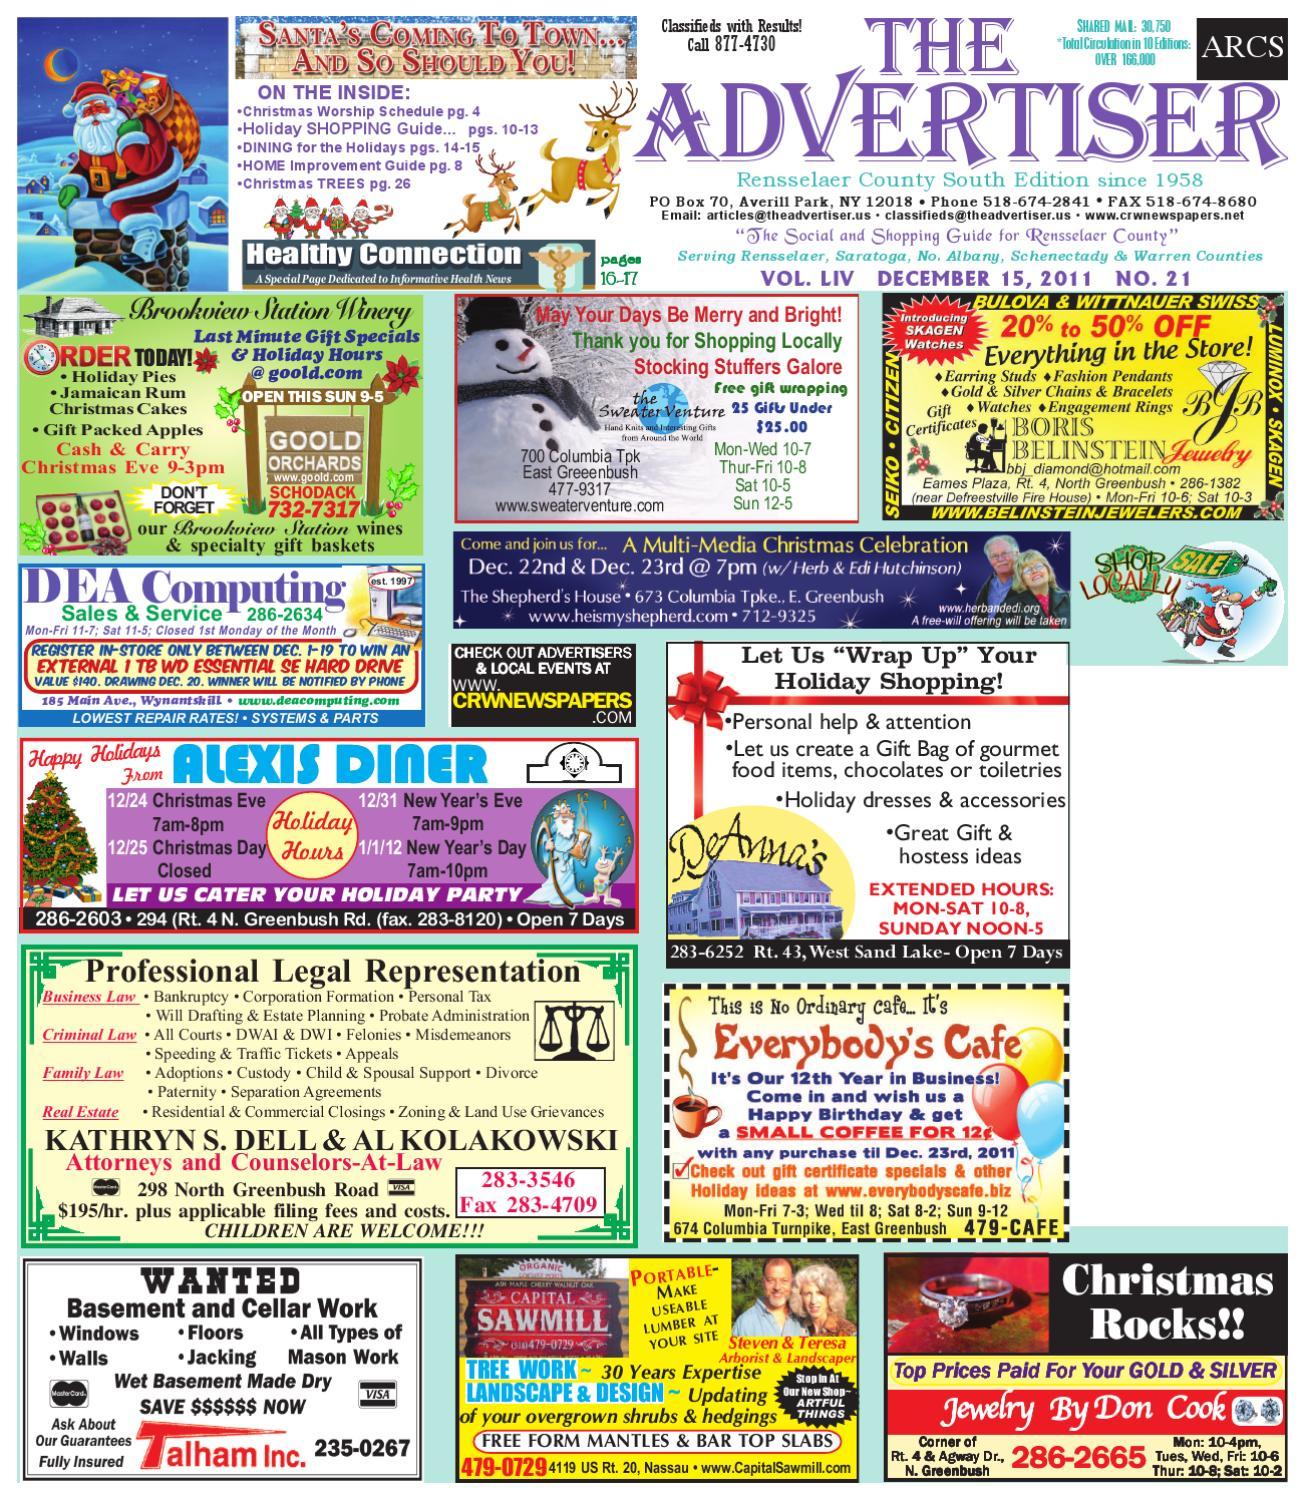 21958db27f0 Advertiser South 121511 by Capital Region Weekly Newspapers - issuu